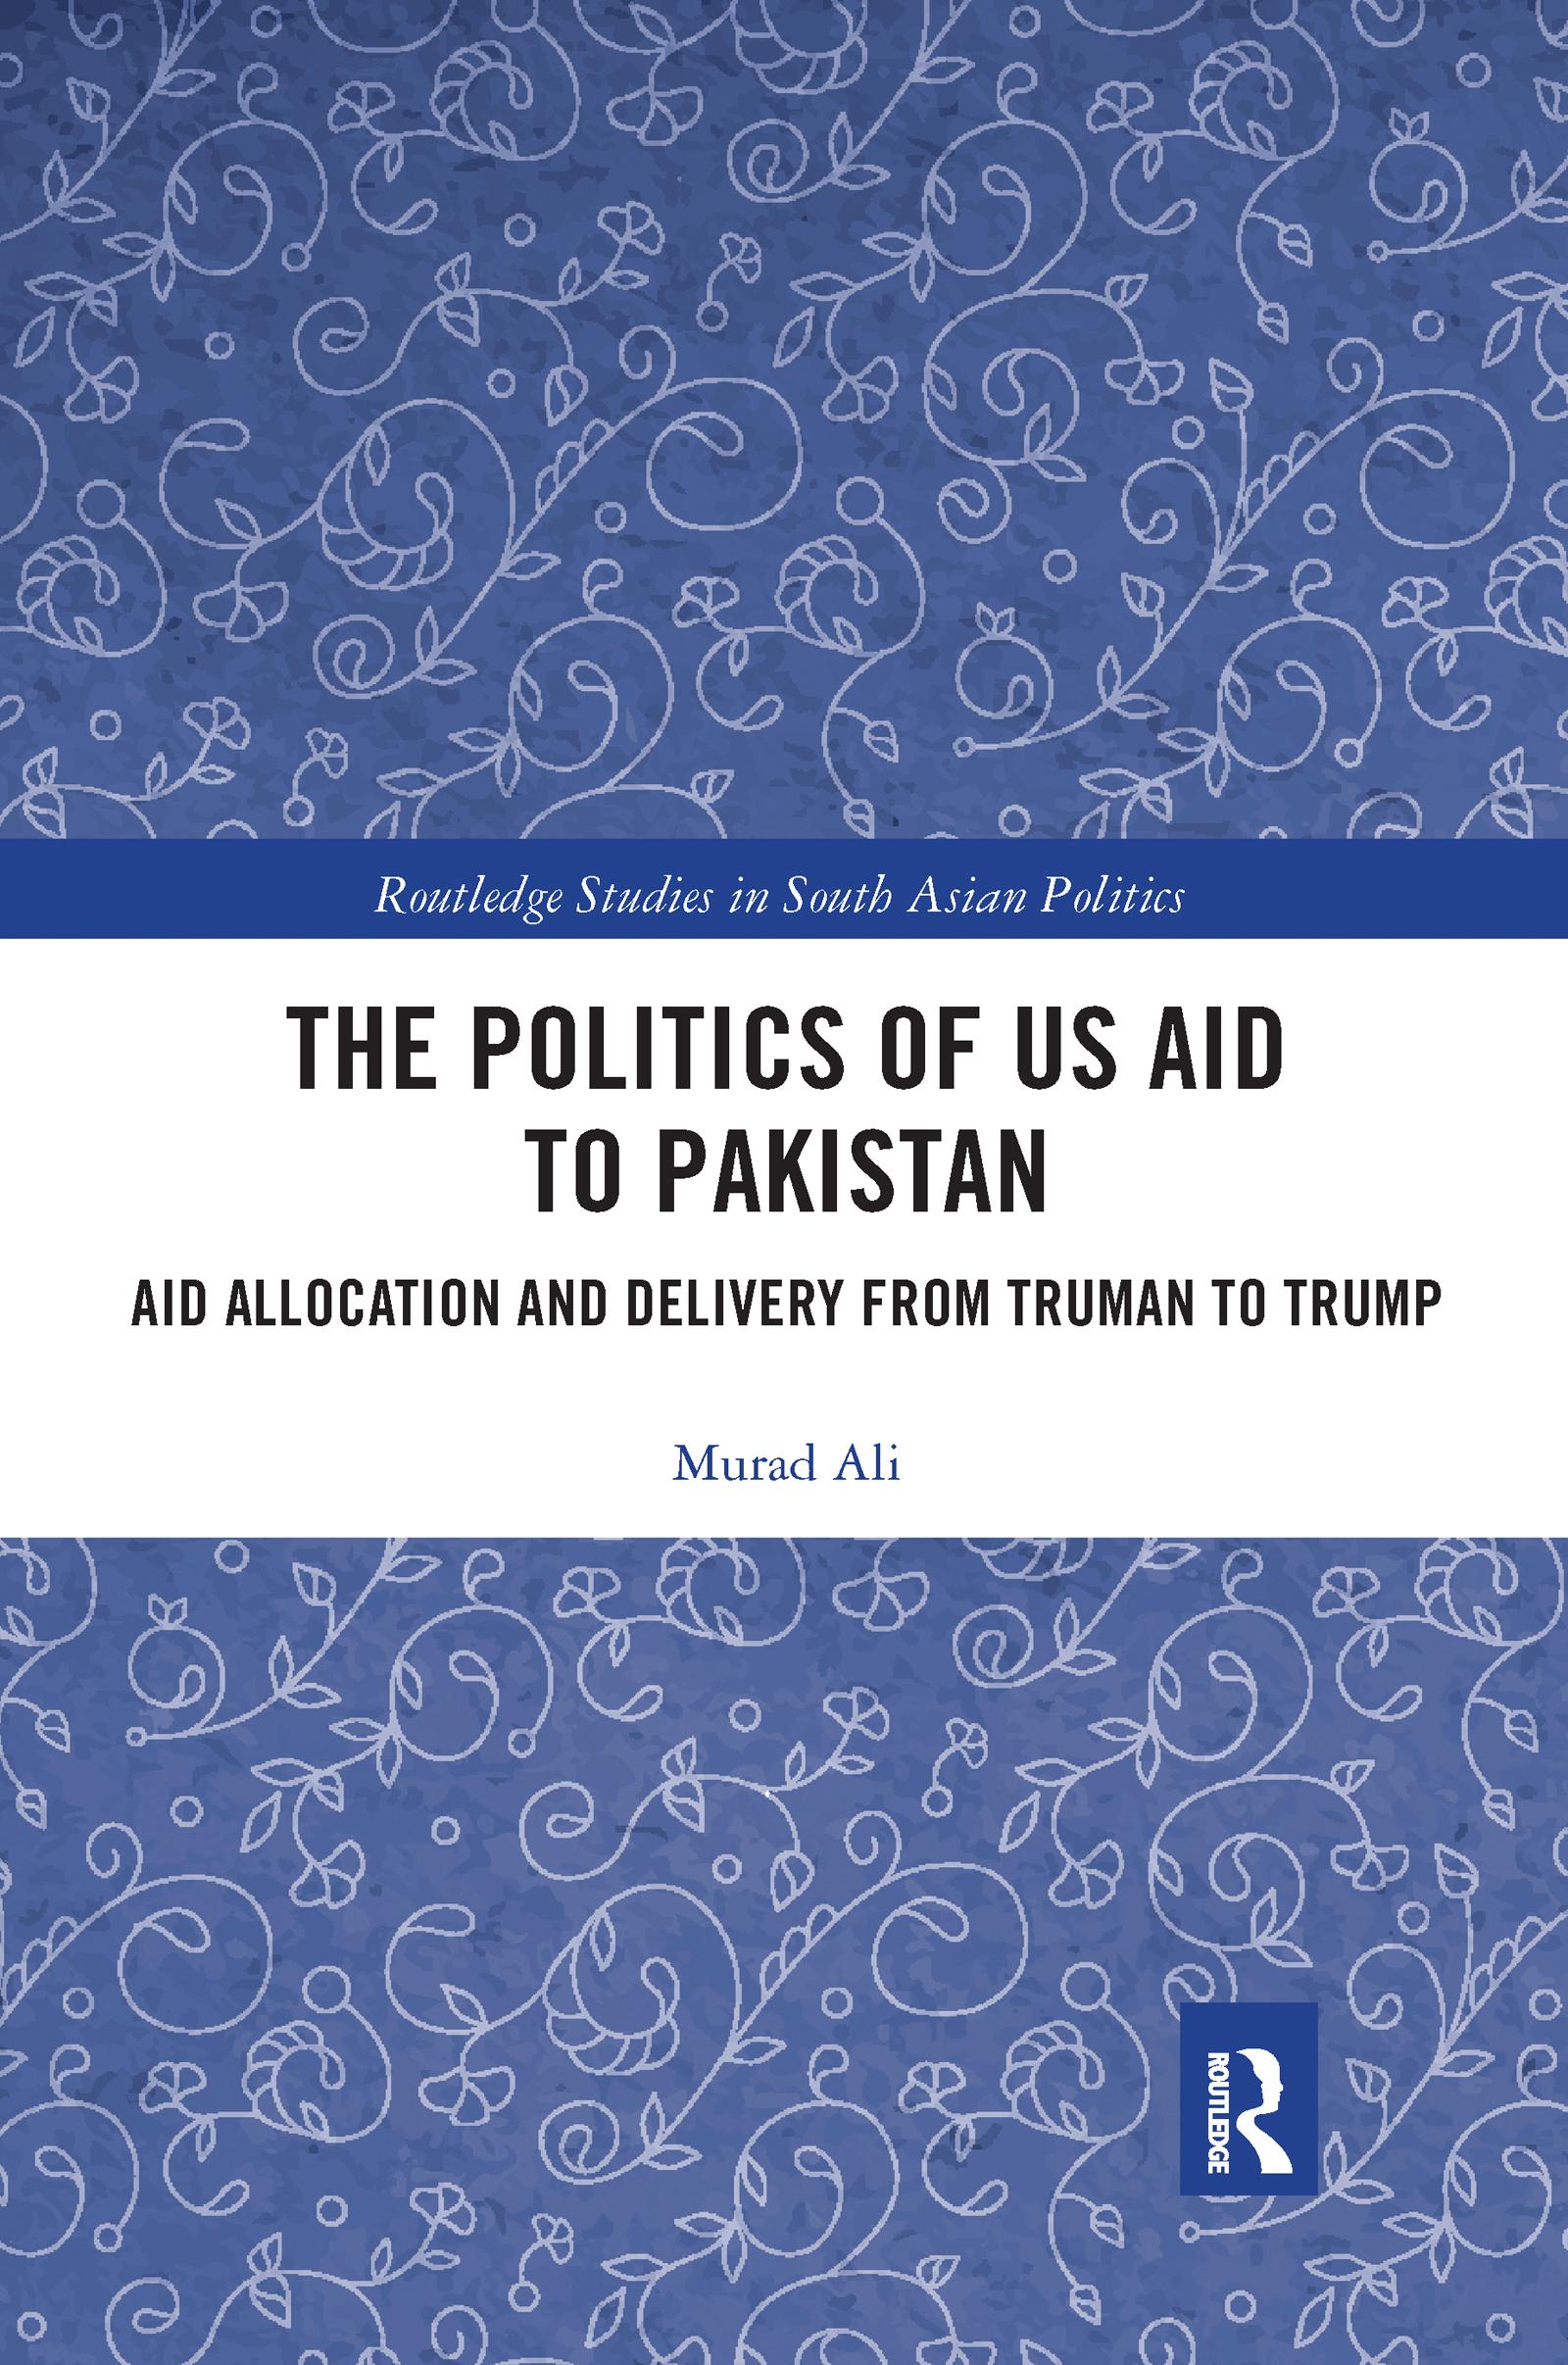 The Politics of US Aid to Pakistan